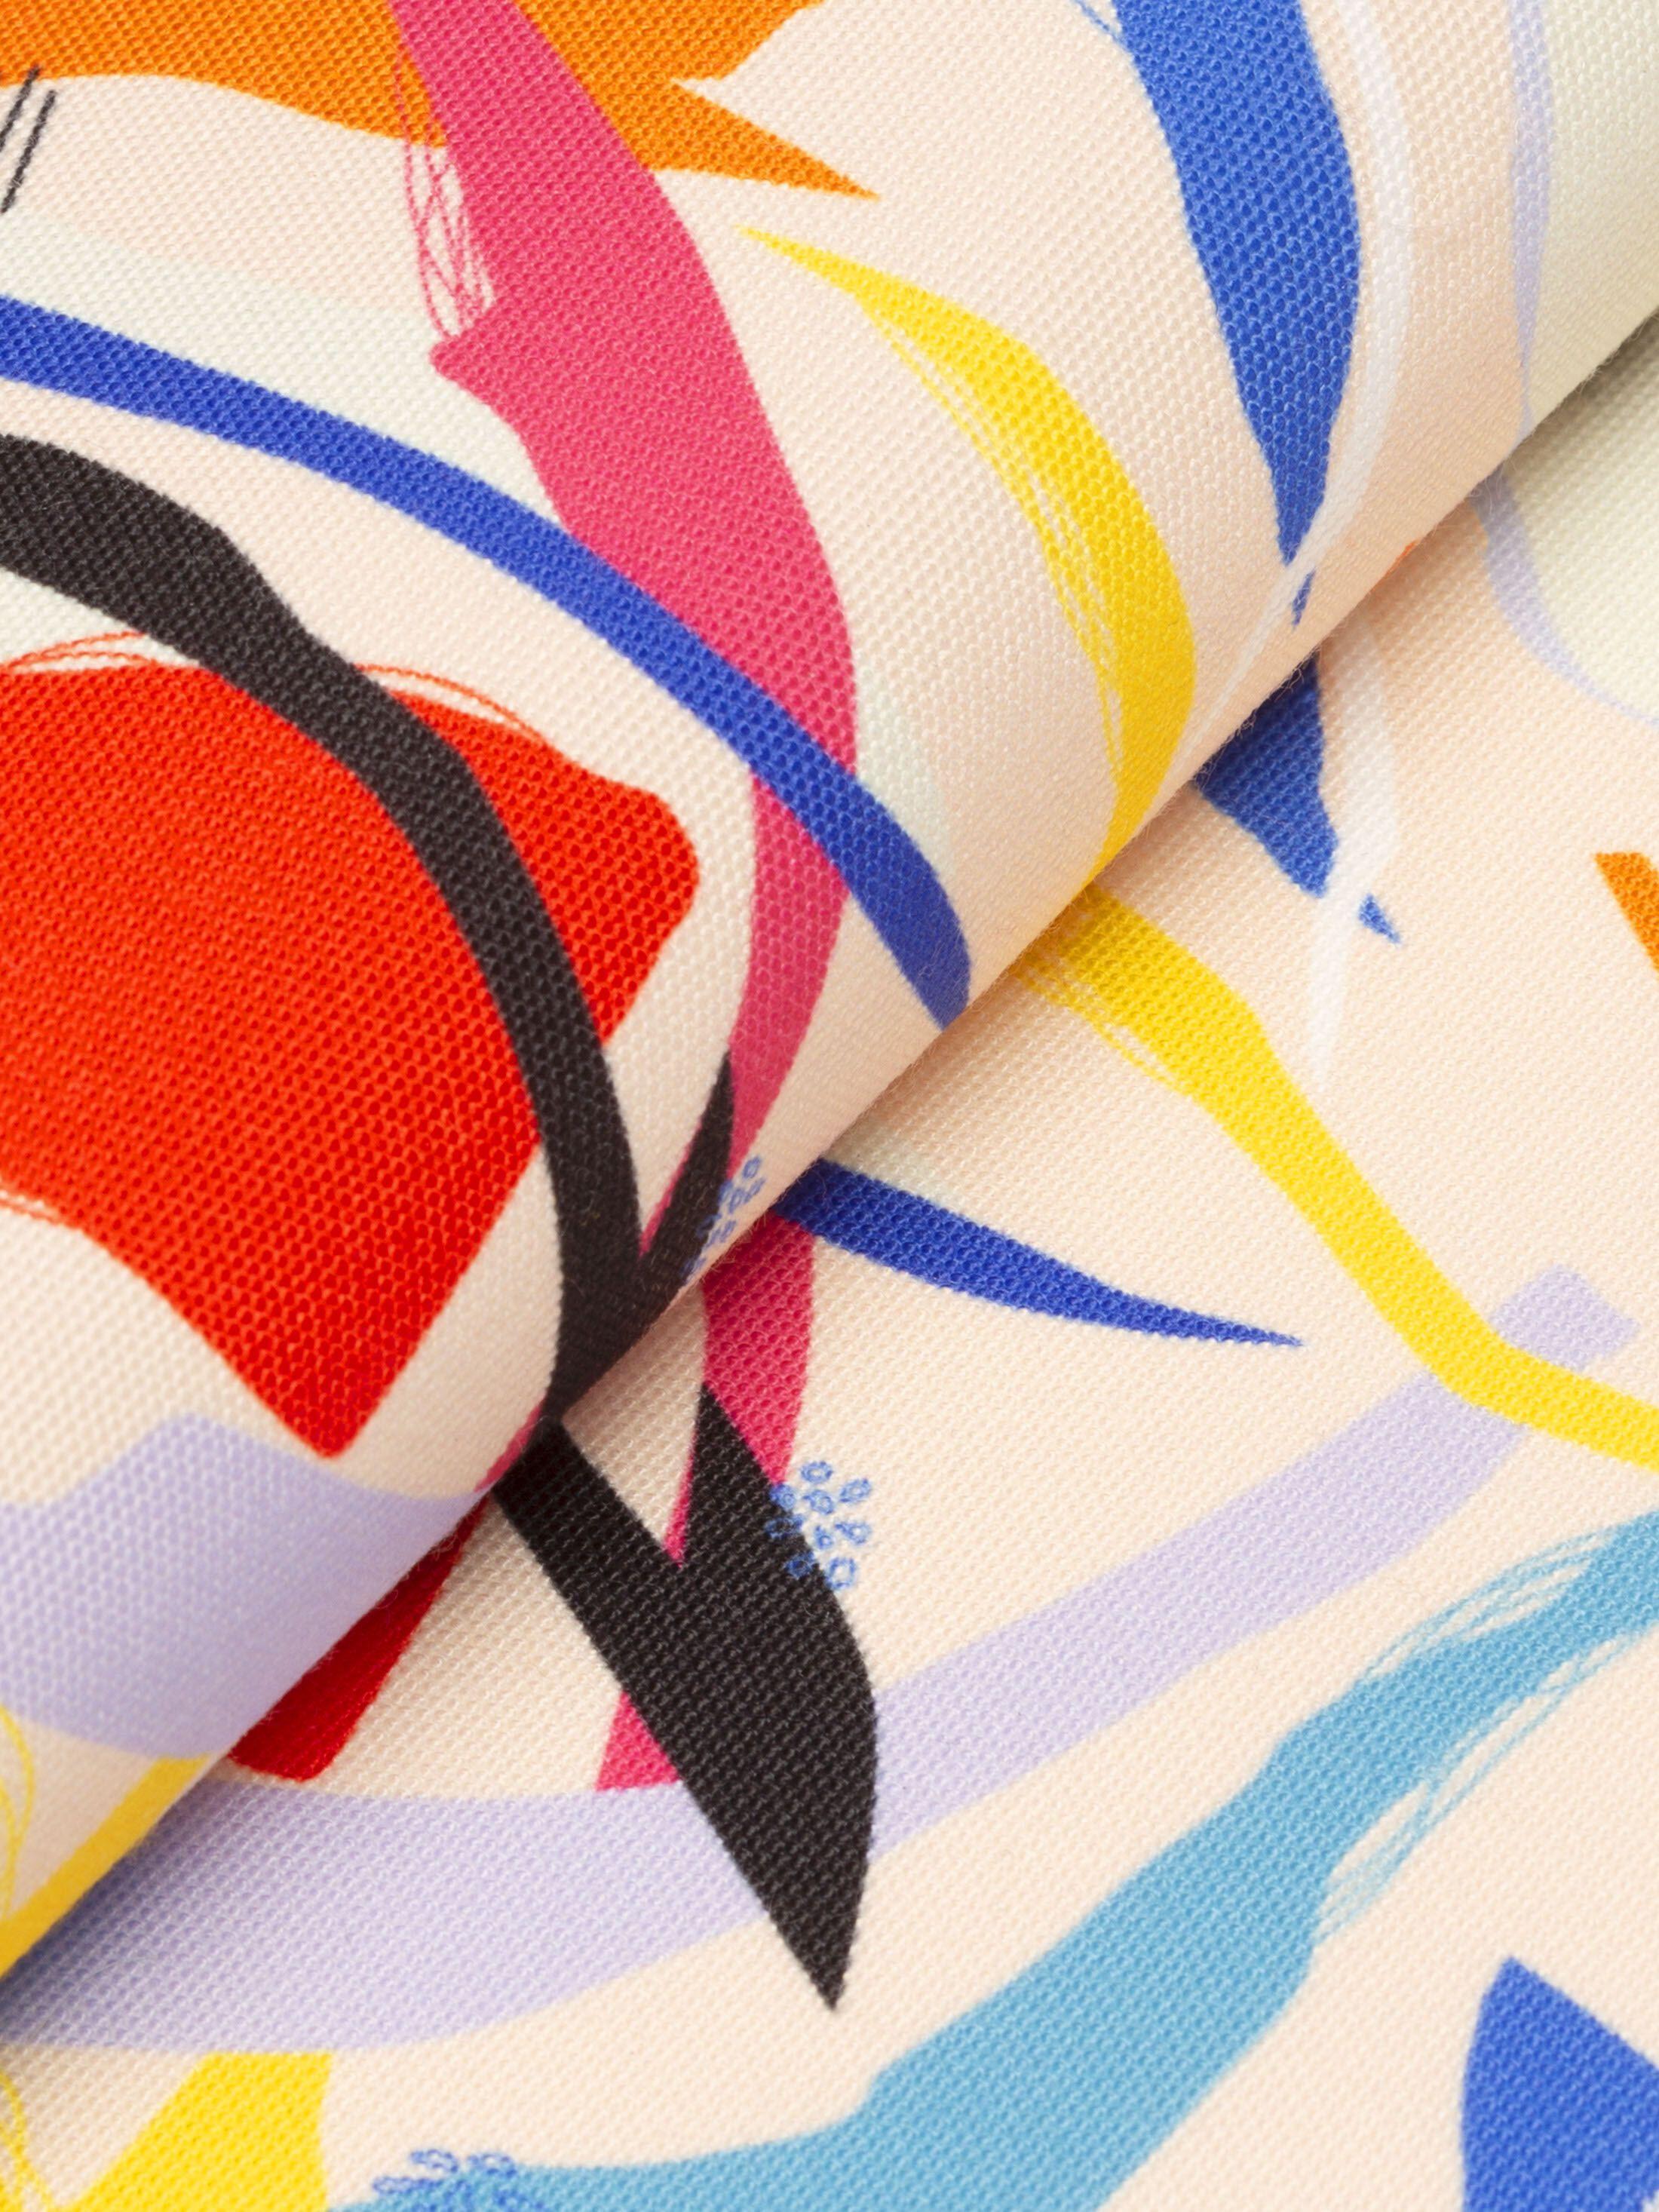 Design Custom Textile Prints Online